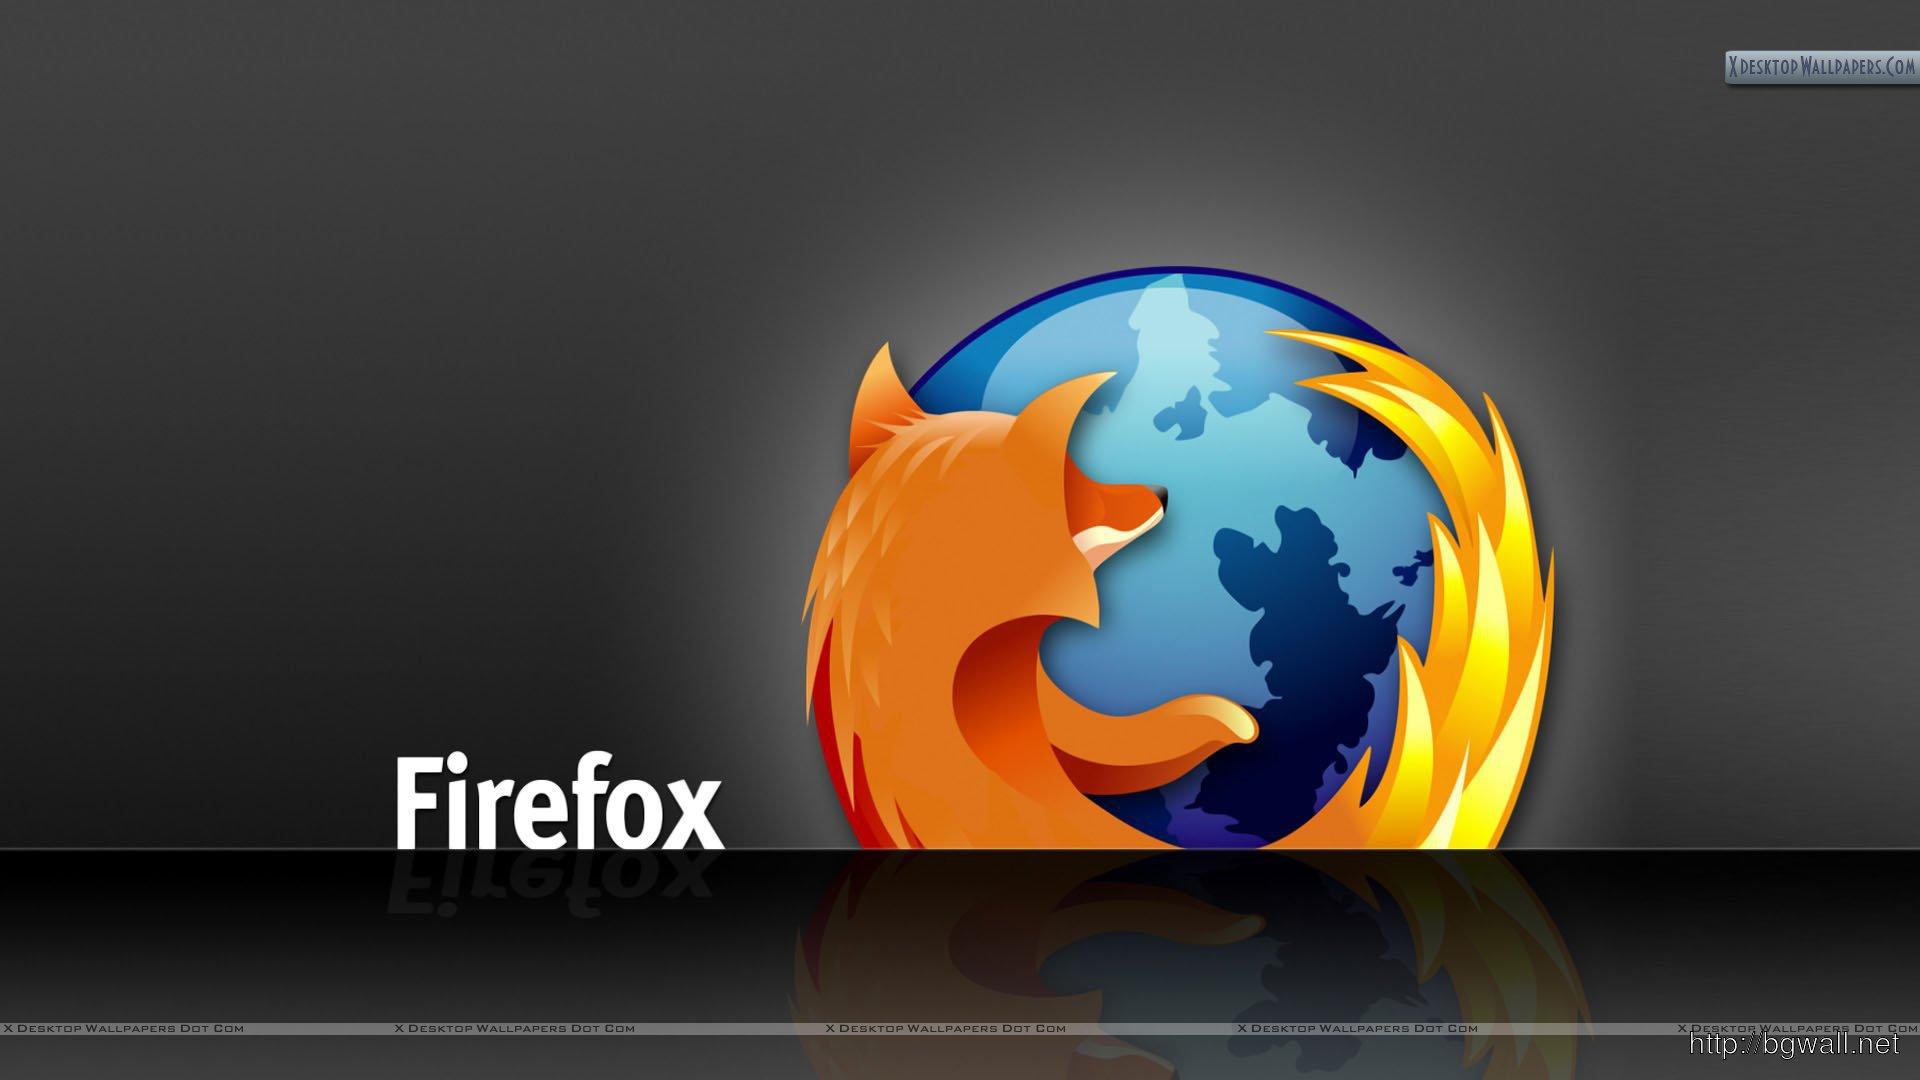 Firefox Awesome Desktop Wallpaper On Black Background Wallpaper Full Size